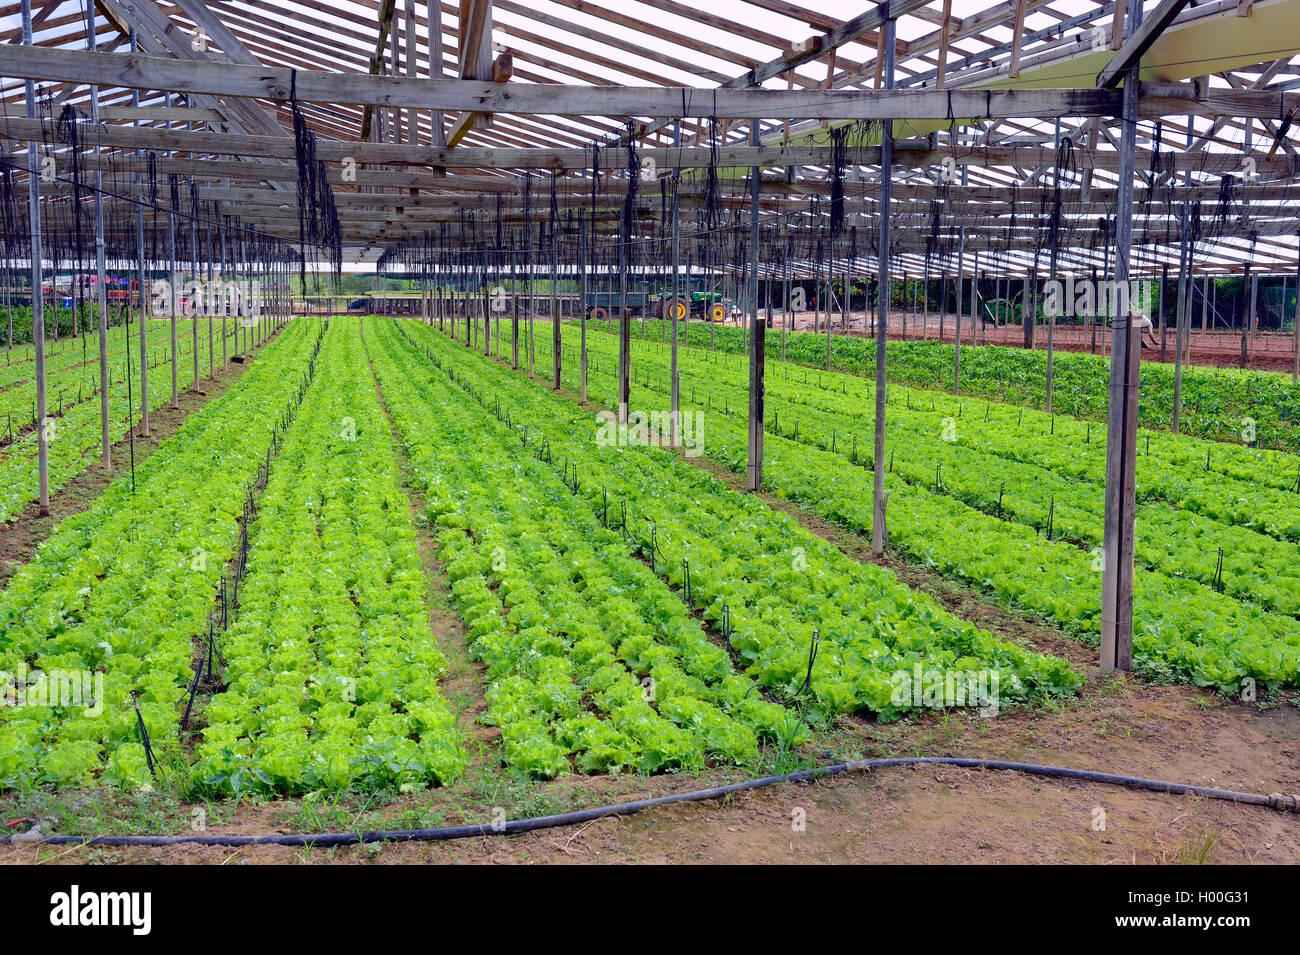 Gemueseanbau Auf der Insel Mahe, Seychellen, Mahe | Gemüseanbau auf Mahe, Seychellen, Mahe | BLWS419460.jpg Stockbild